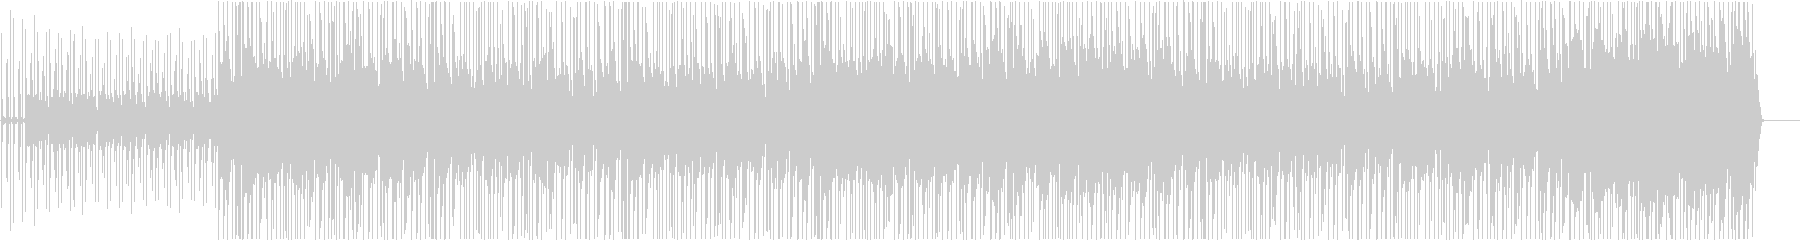 lstの未再生の波形